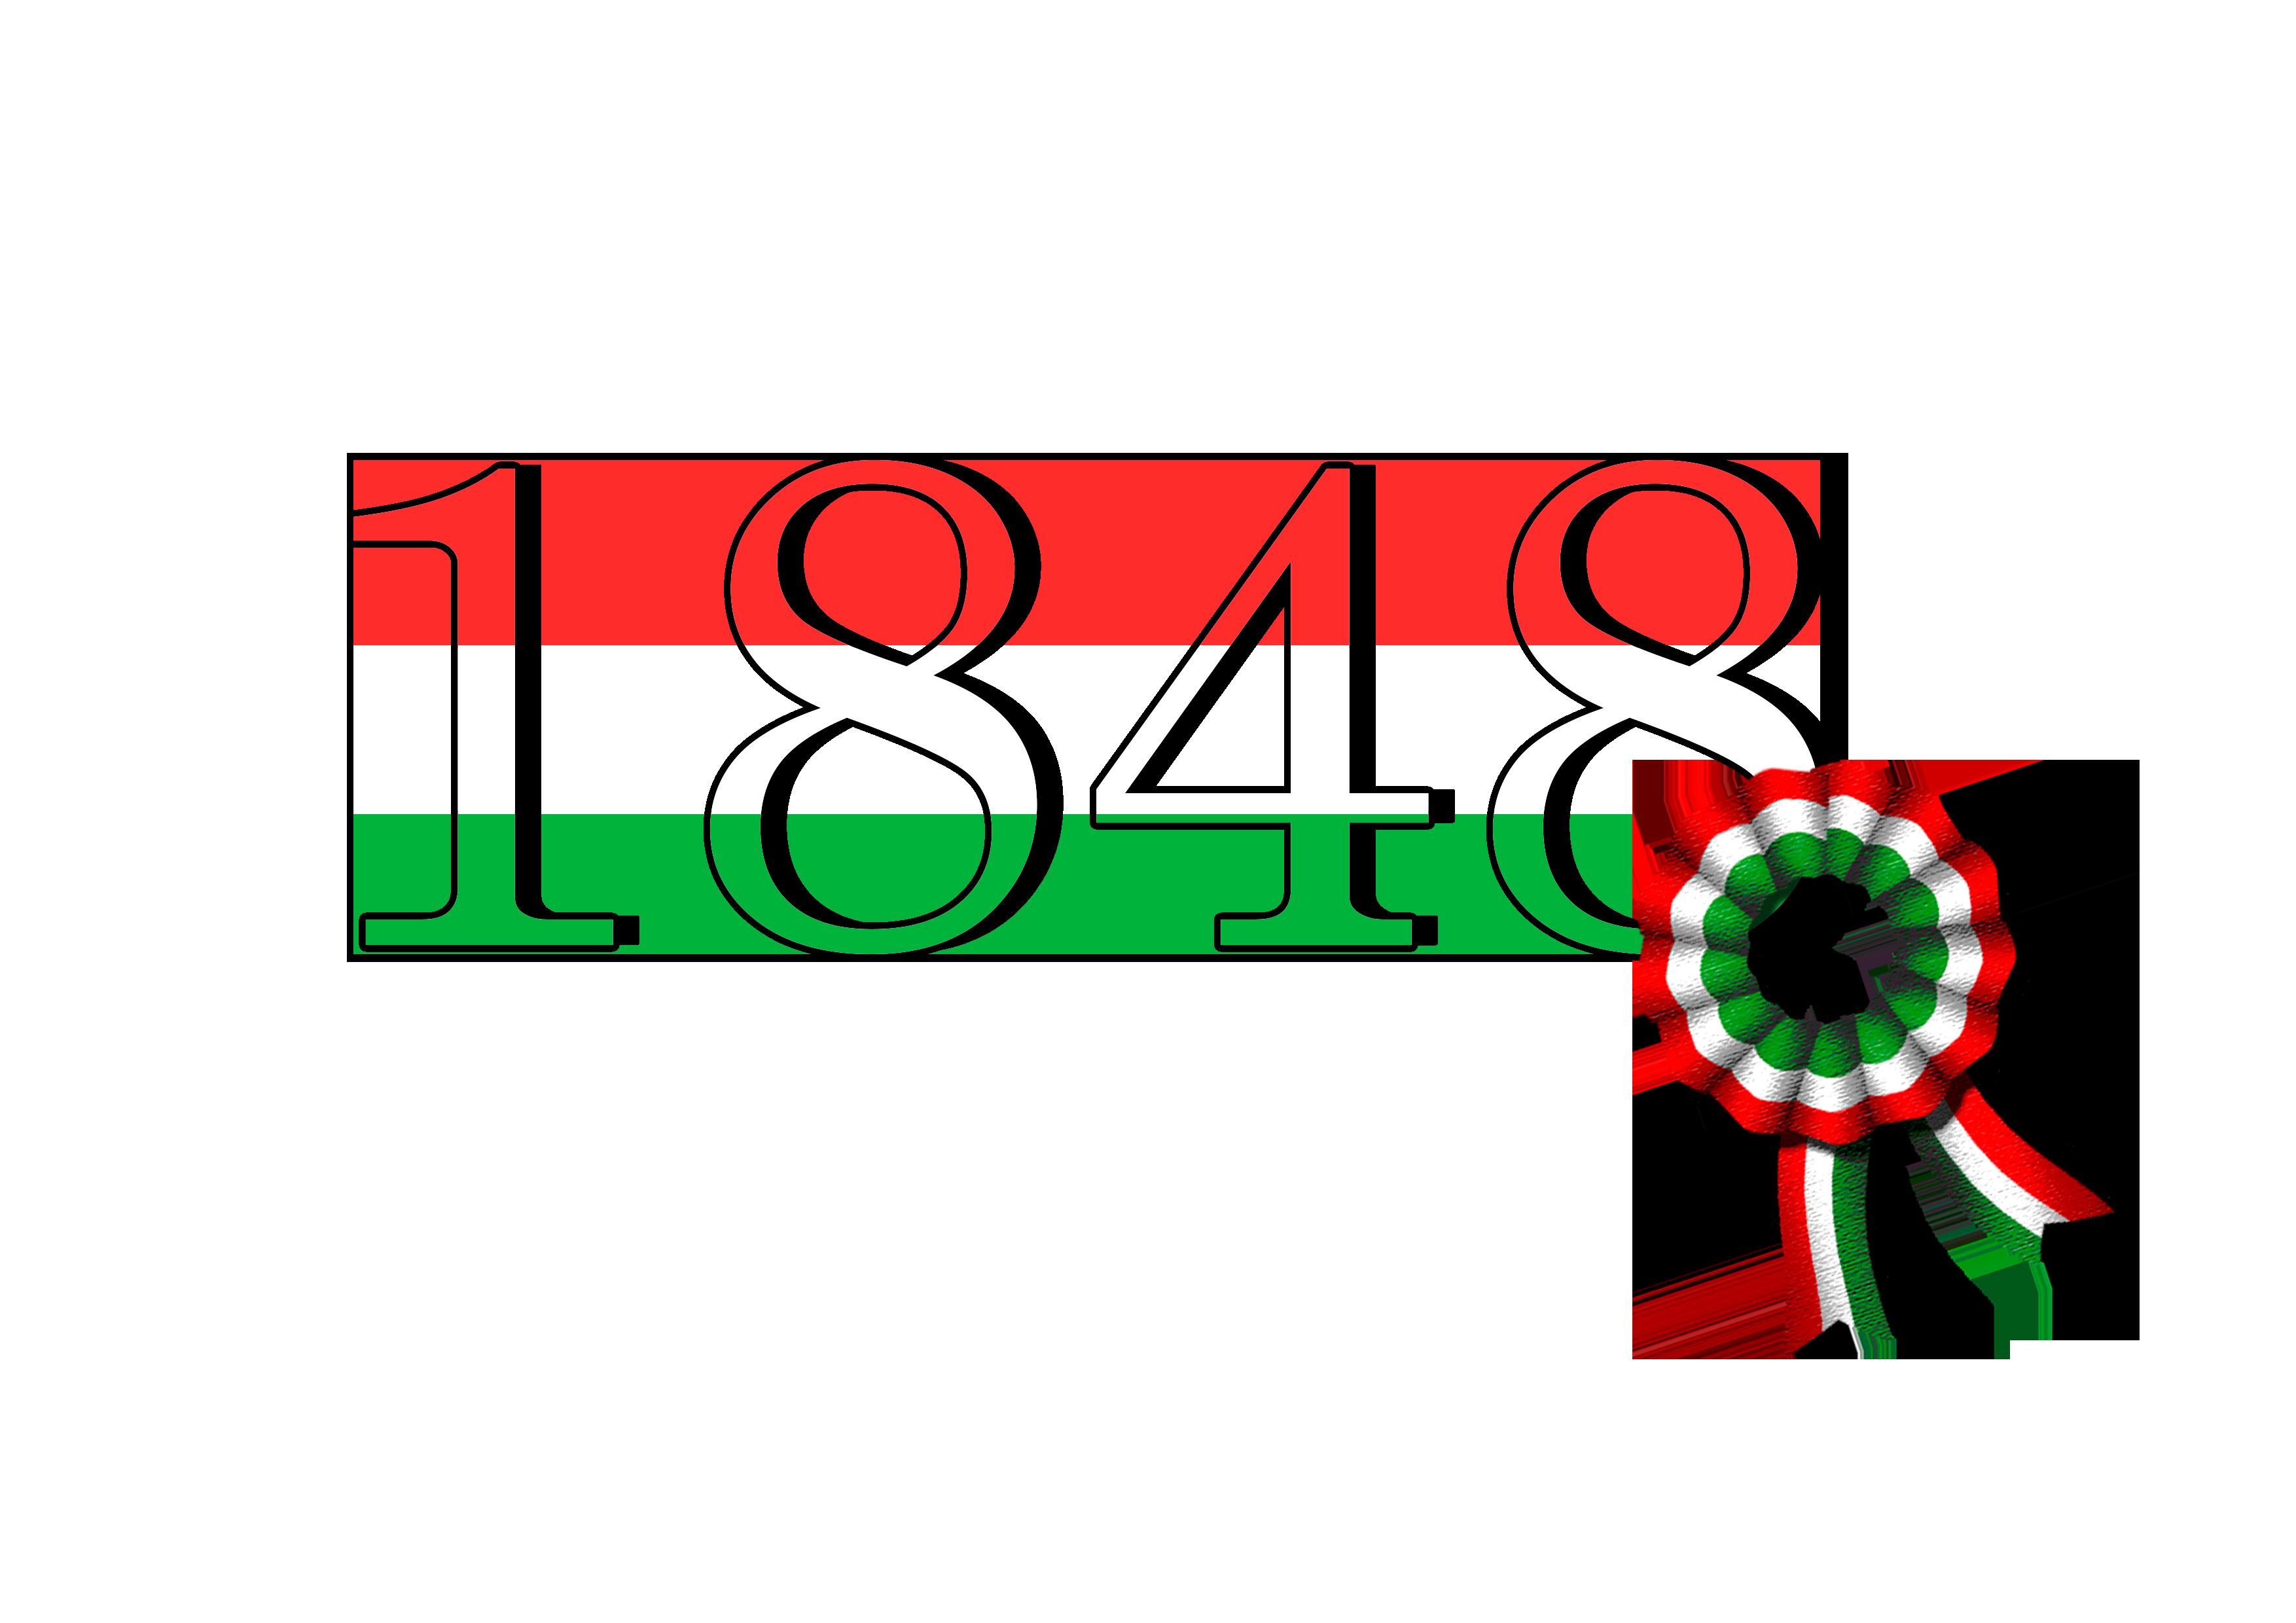 1848_szines.png